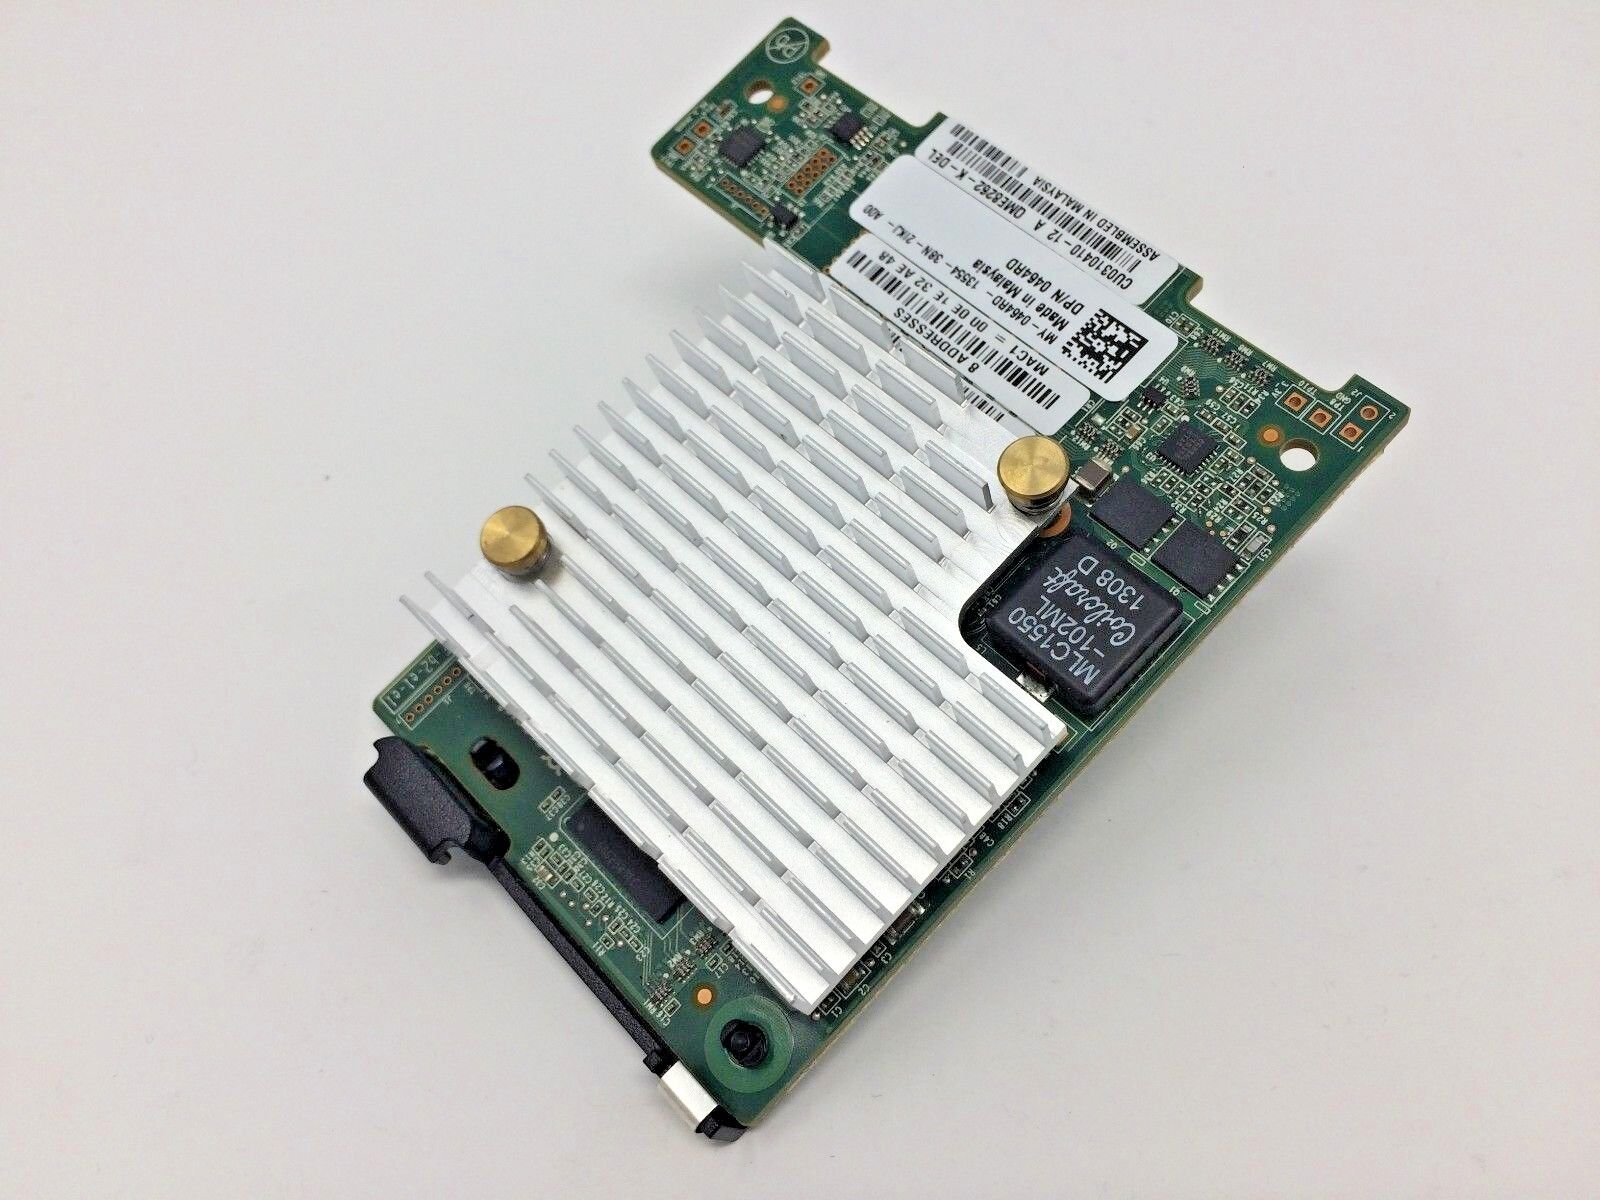 464RD Dell Qlogic Dual Port 10GB/s Fibre Channel Network Card 0464RD QME8262-K-D